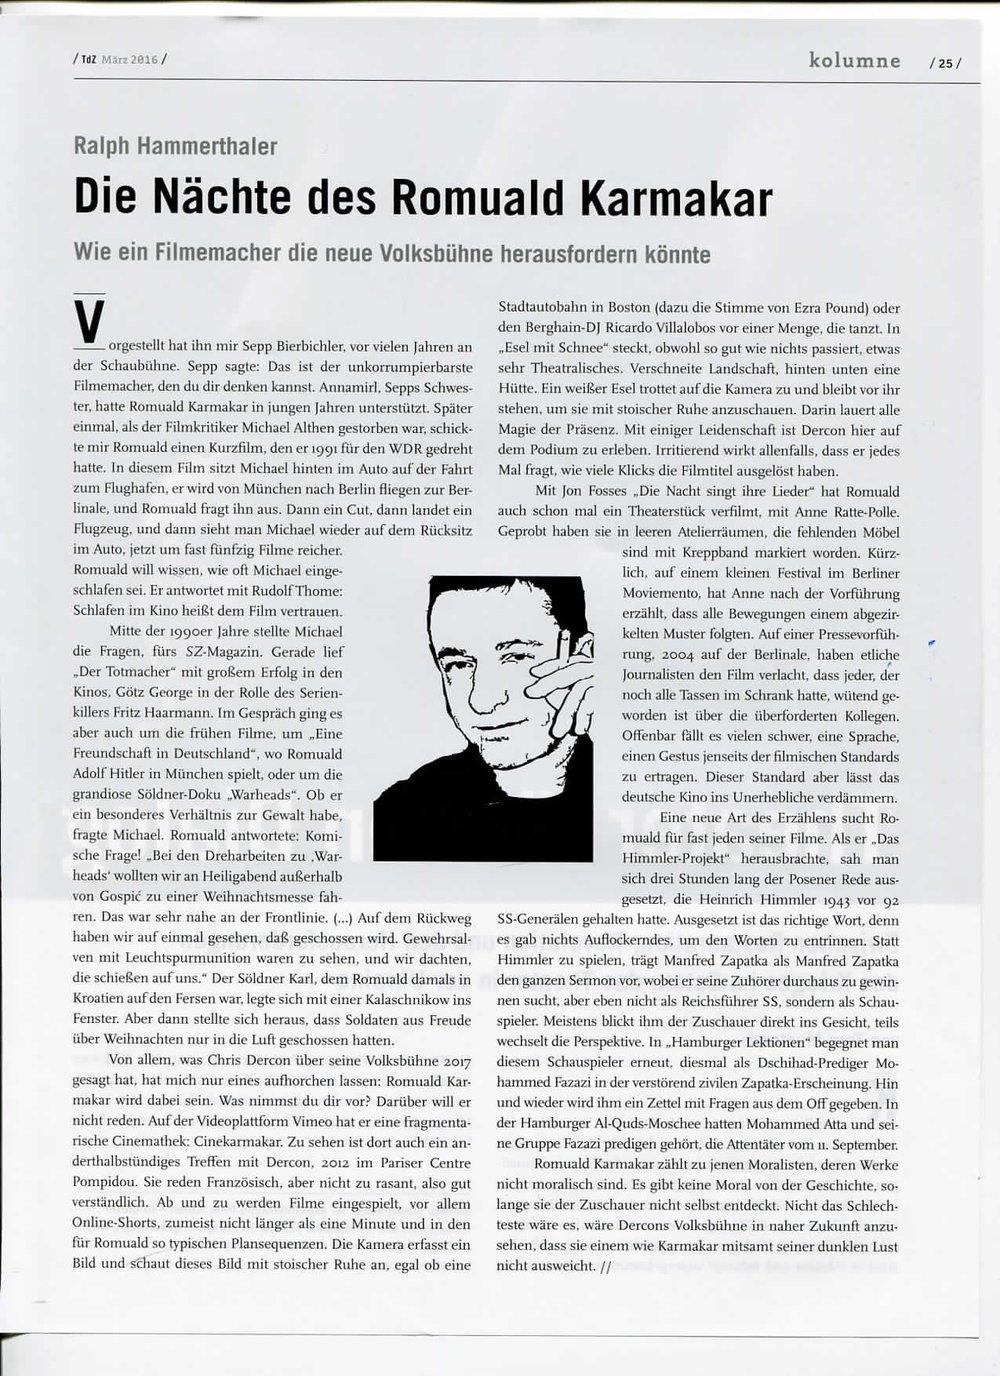 DIE NÄCHTE DES ROMUALD KARMAKAR